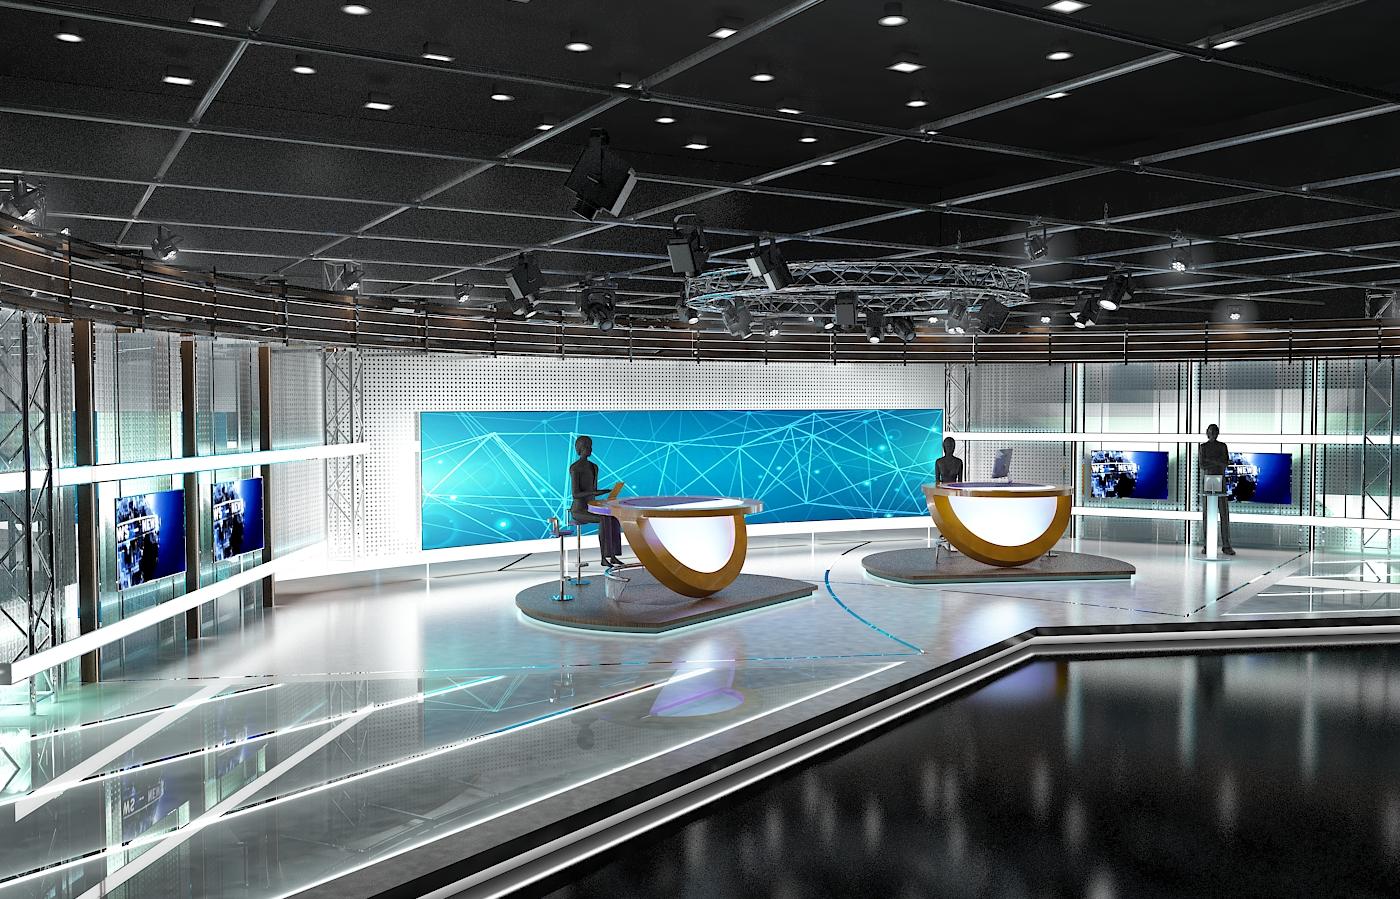 виртуал телевизийн студи цуглуулга vol 6 3d загвар max dxf dwg fbx obj 223397